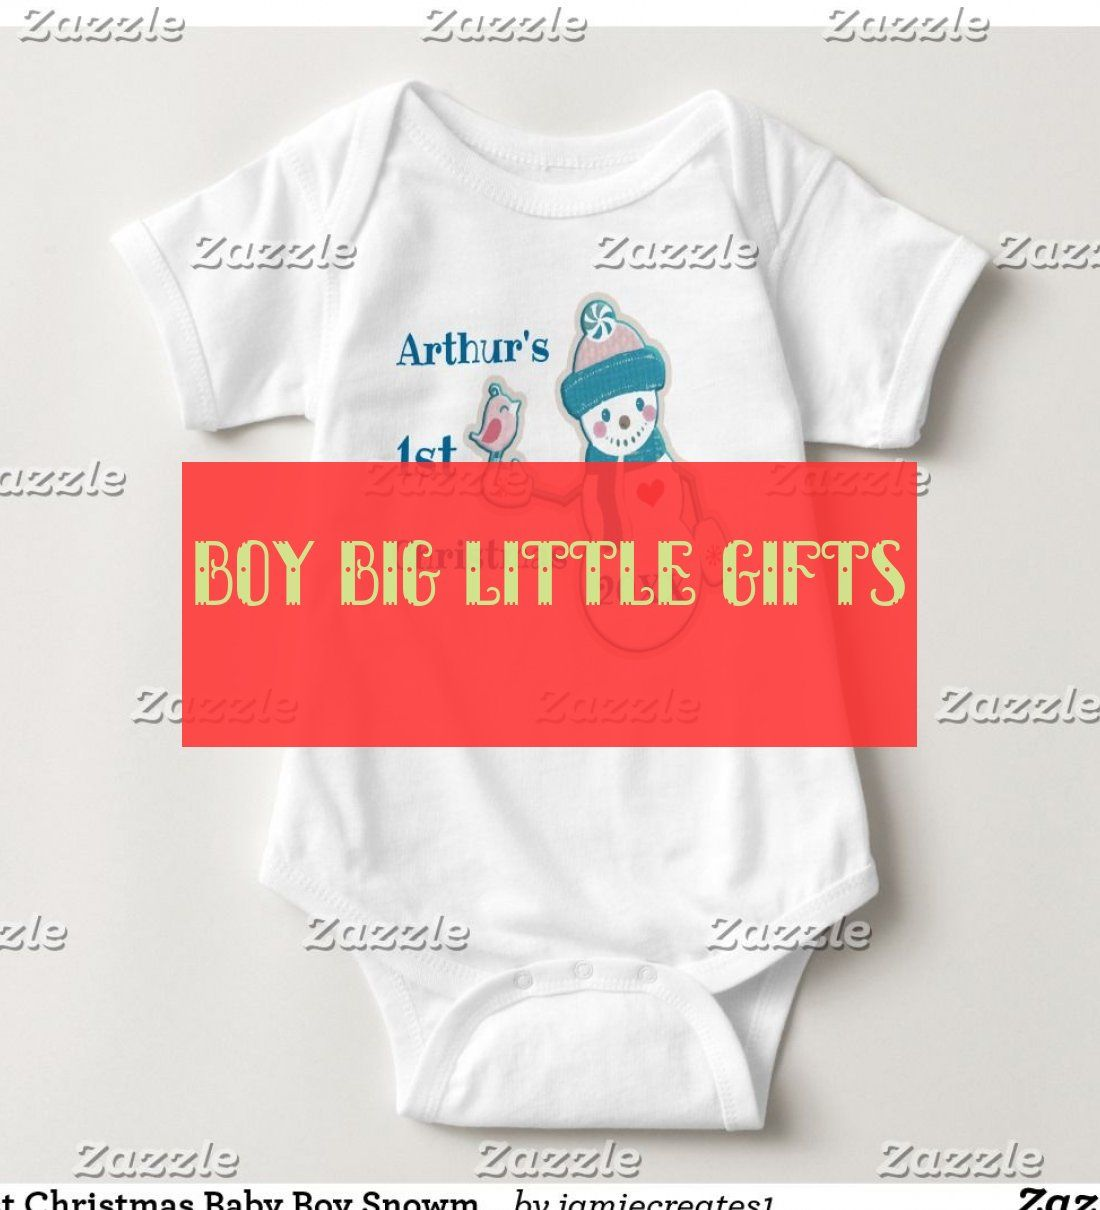 Boy big little gifts